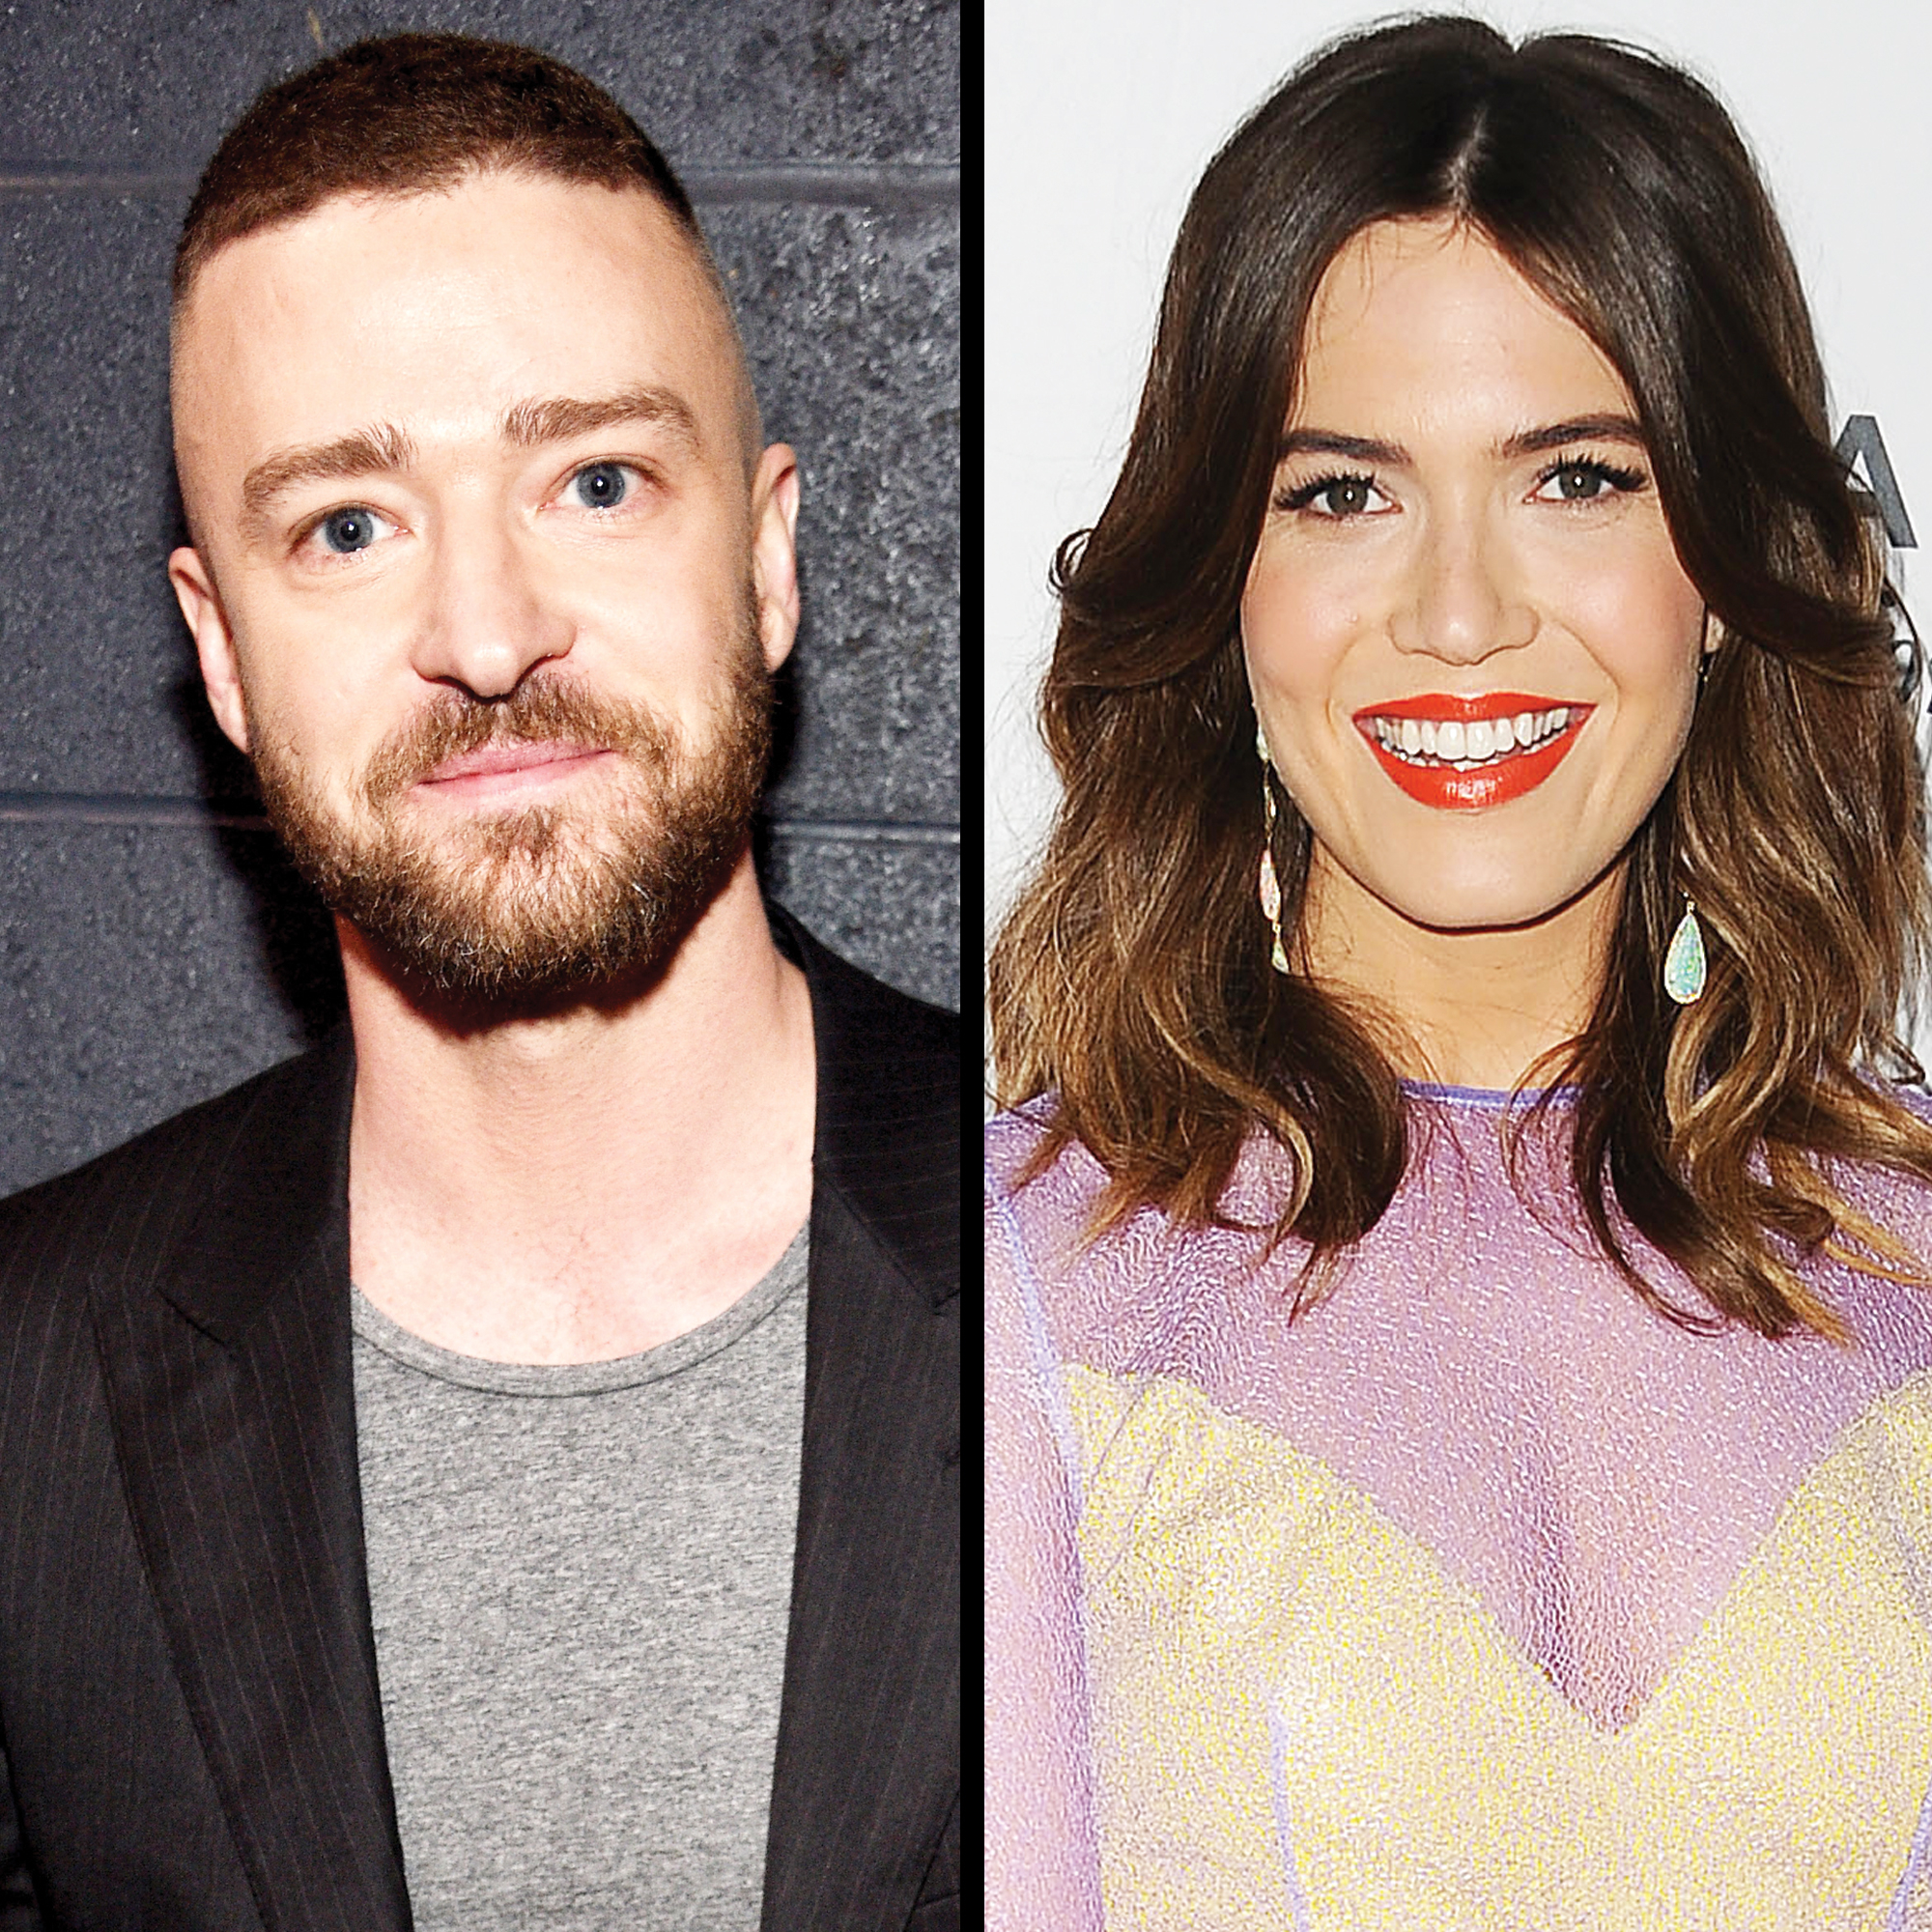 Justin Timberlake and Mandy Moore